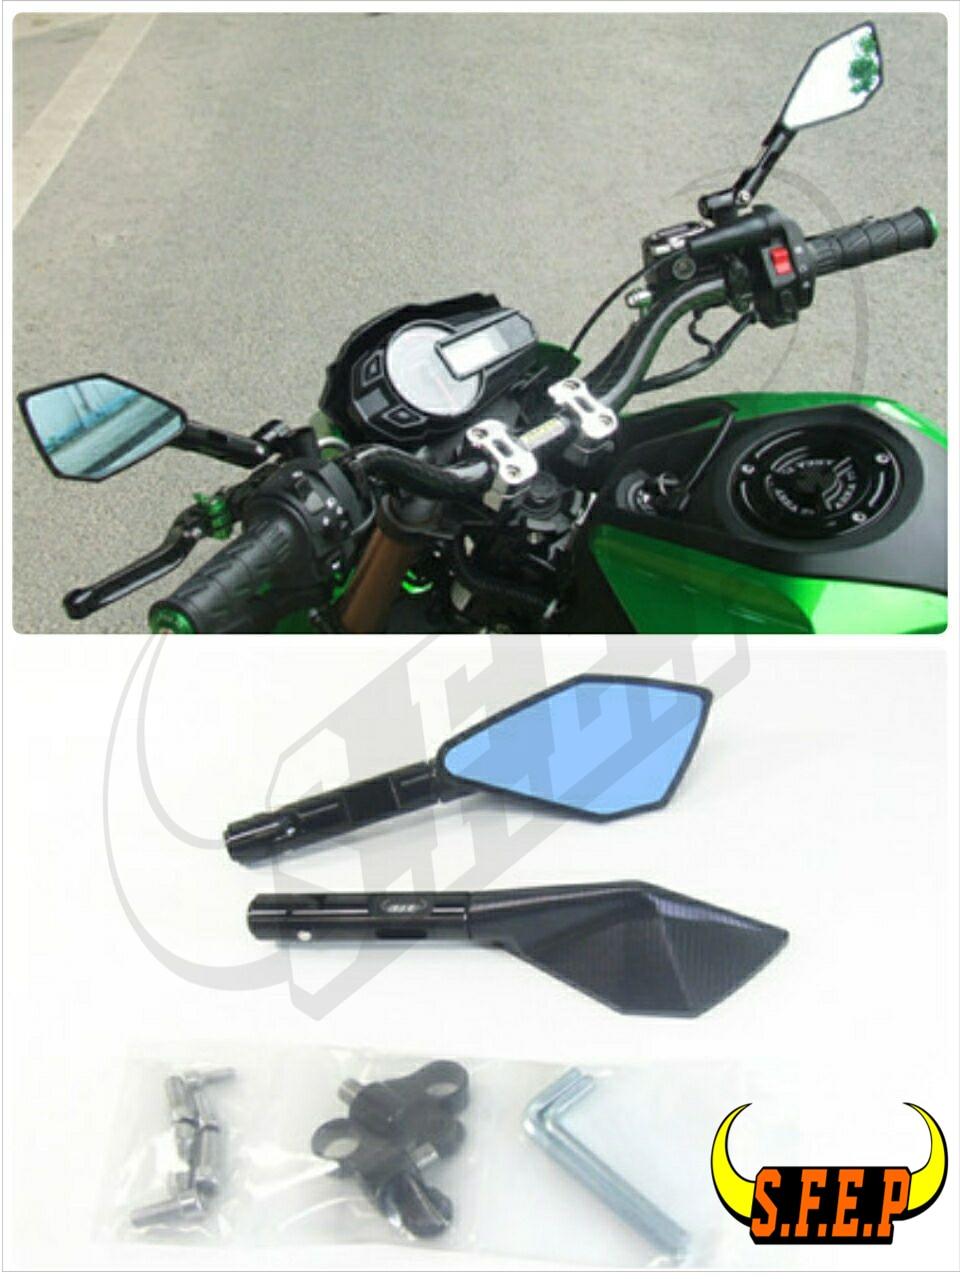 Motorcycle Univers CNC Aluminum Handle Bar Mirrors For BMW Kawasaki Honda KTM Yamaha Suzuki Ducati Aprilia Triumph Buell Guzzi